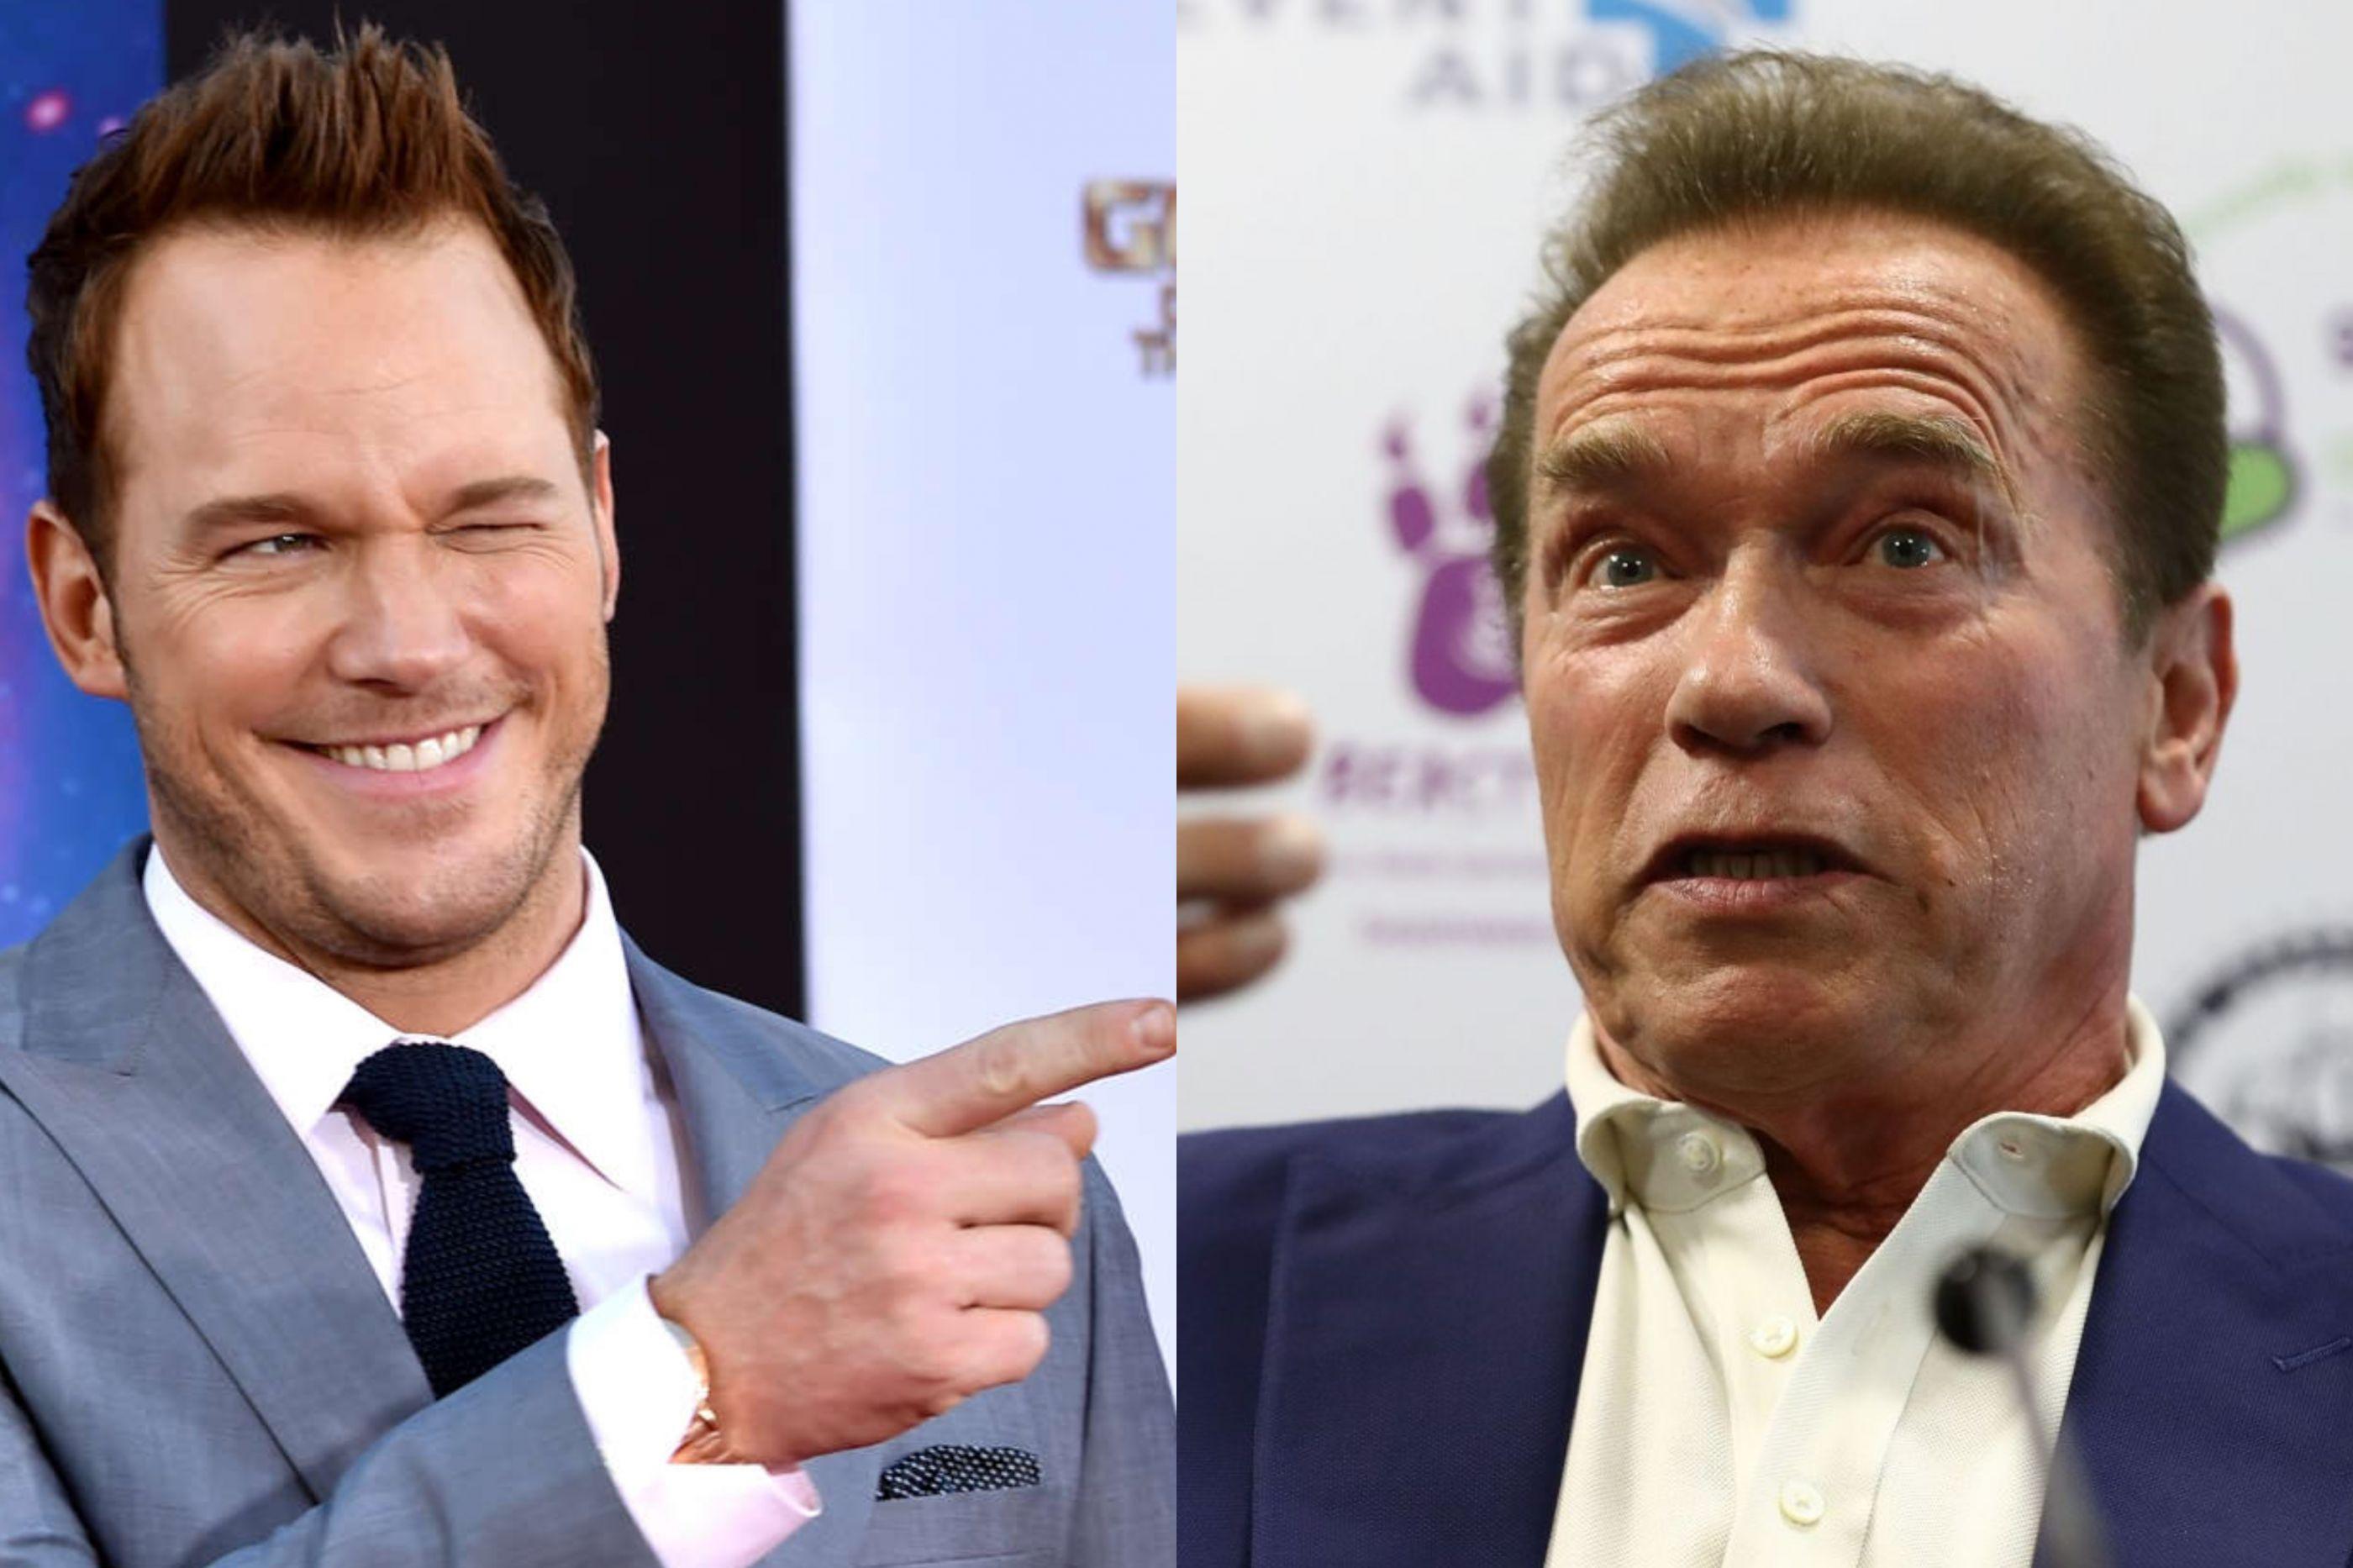 Chris Pratt pediu a mão ao futuro sogro, Arnold Schwarzenegger